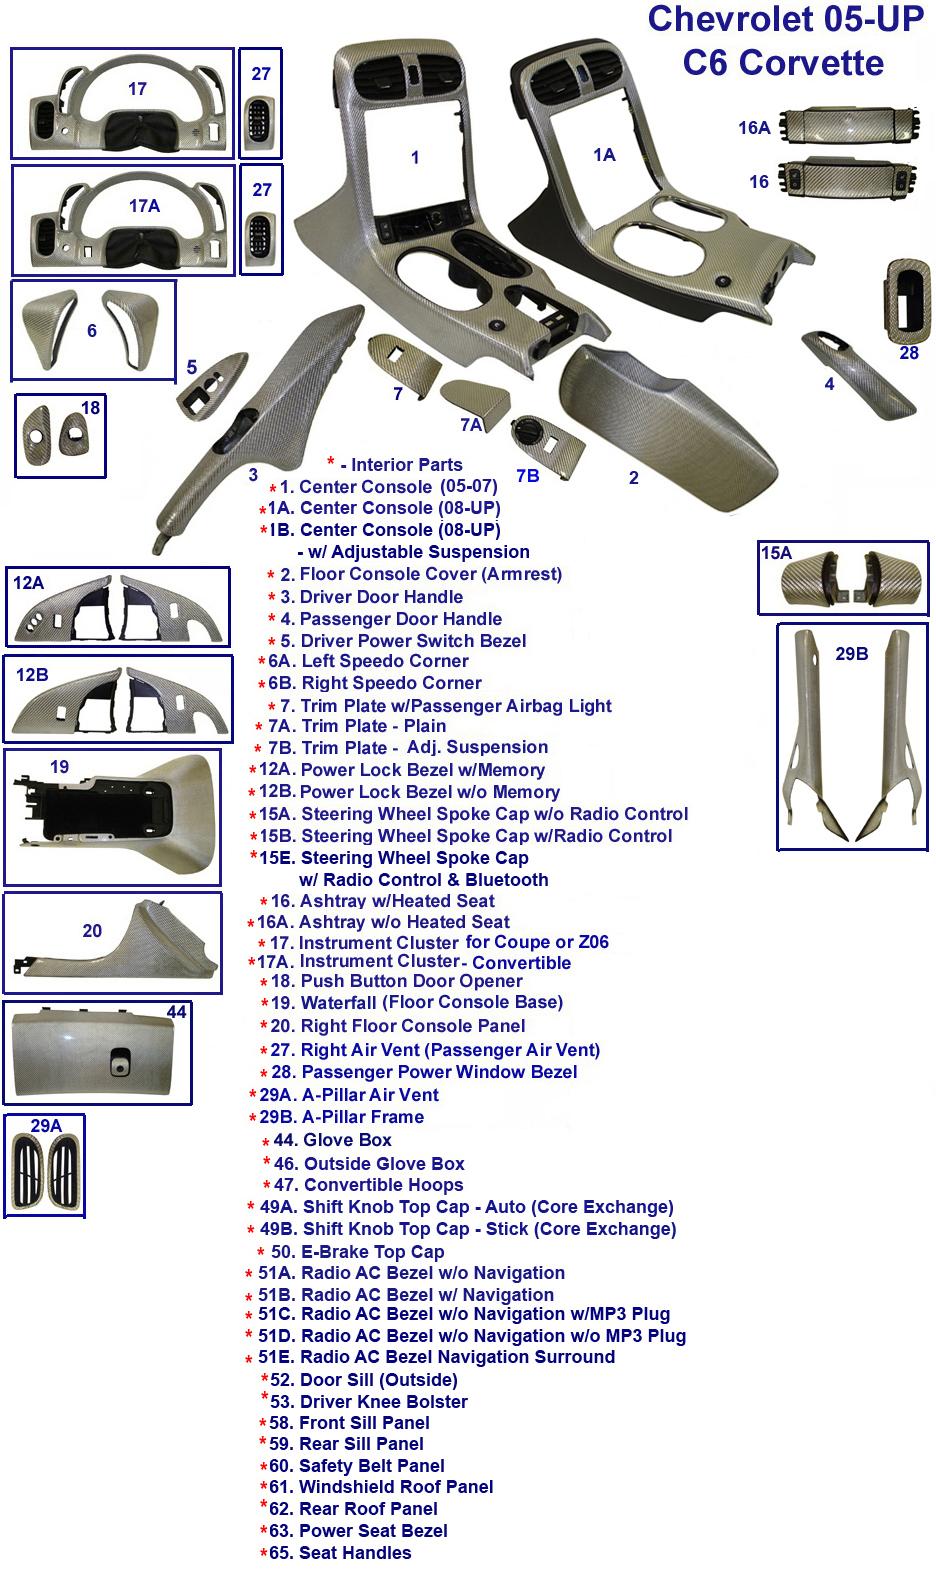 C6 Corvette Silver  CF - Diagram - Interior - 768